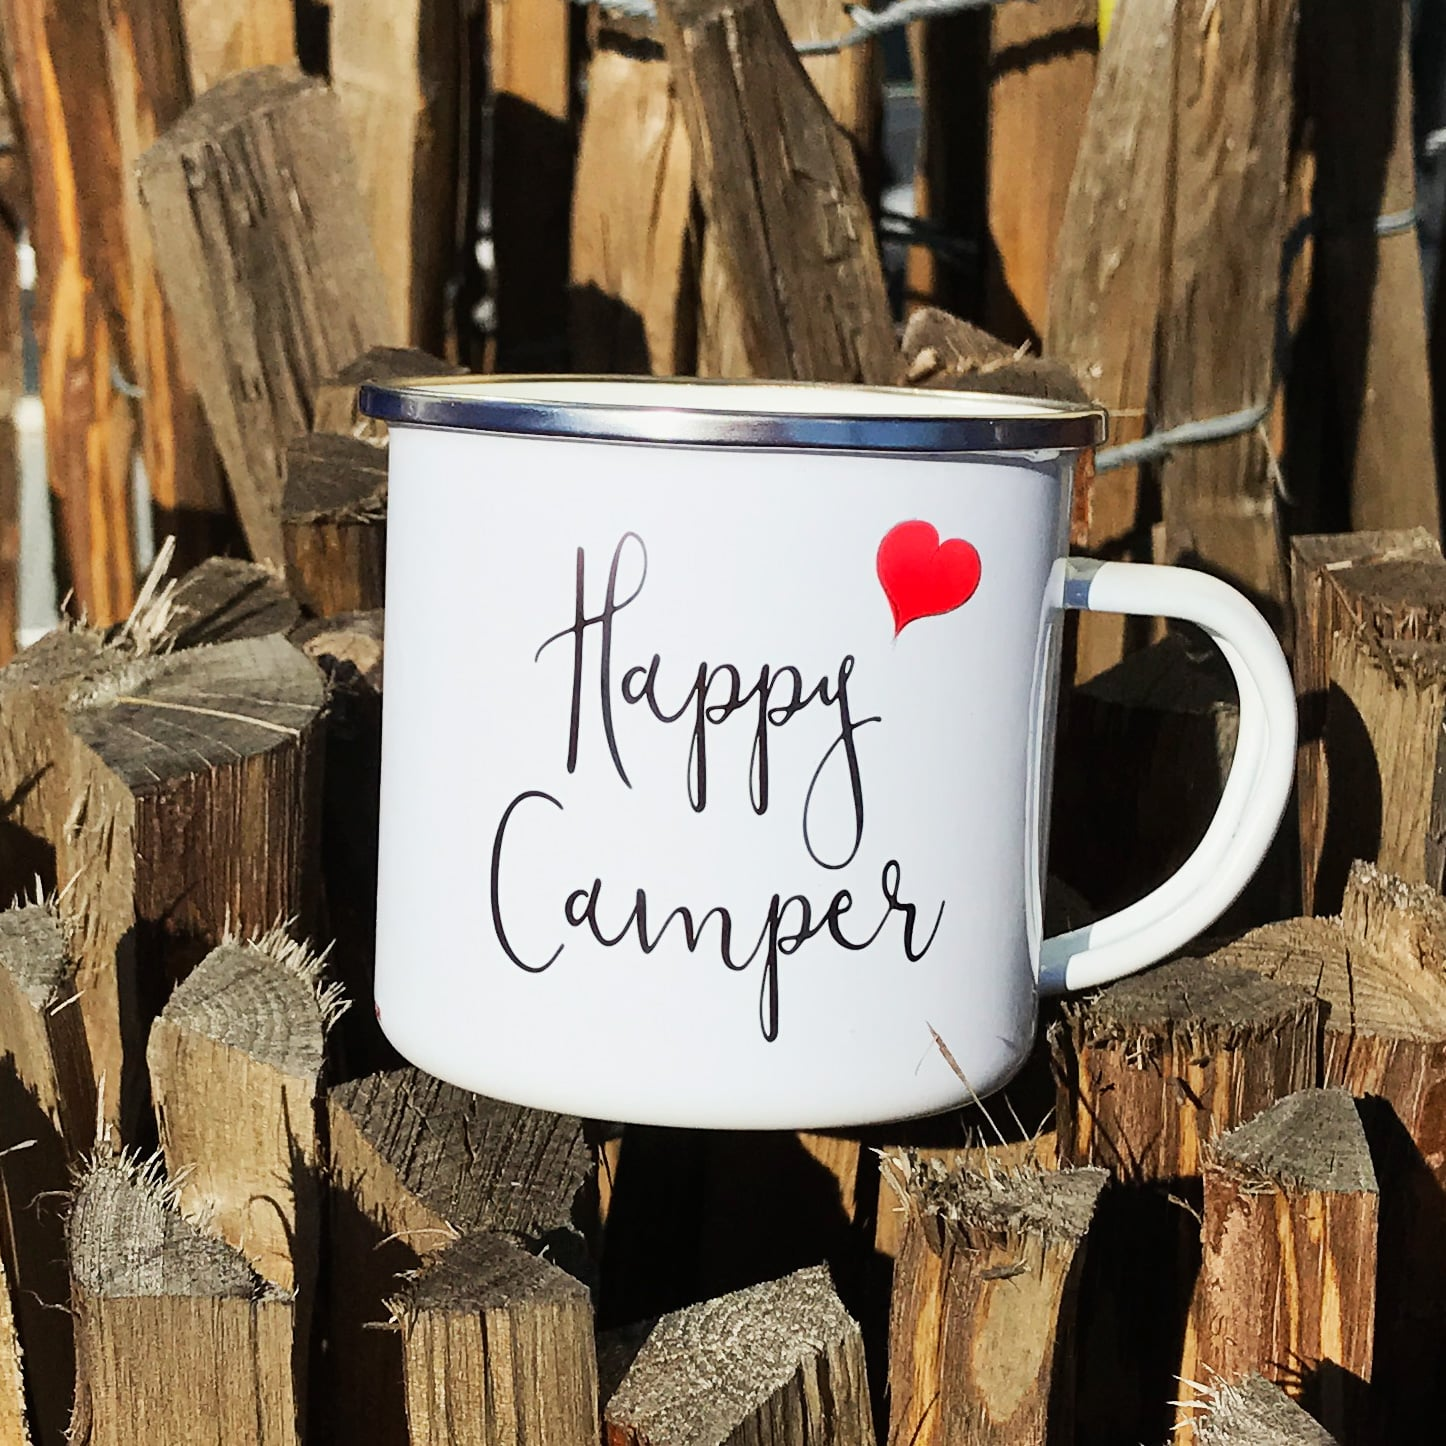 Camping Tasse mit Motiv HAPPY CAMPER